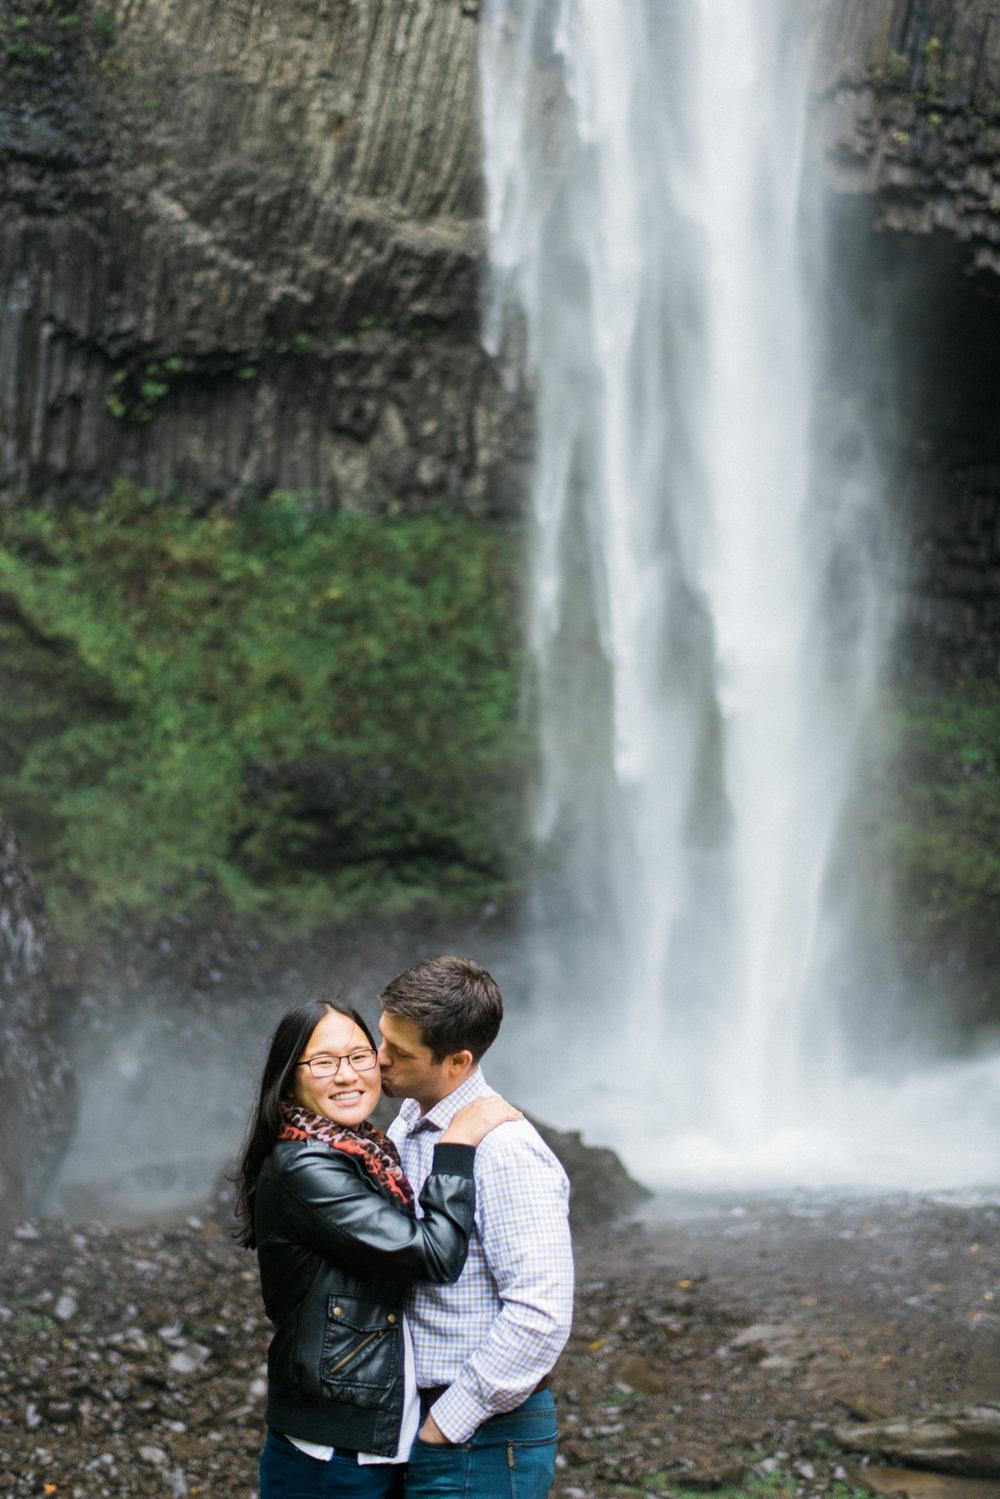 portland-engagment-colubia-river-gorge-latourell-waterfall-autumn-fall-crown-point-shelley-marie-photo-42.jpg